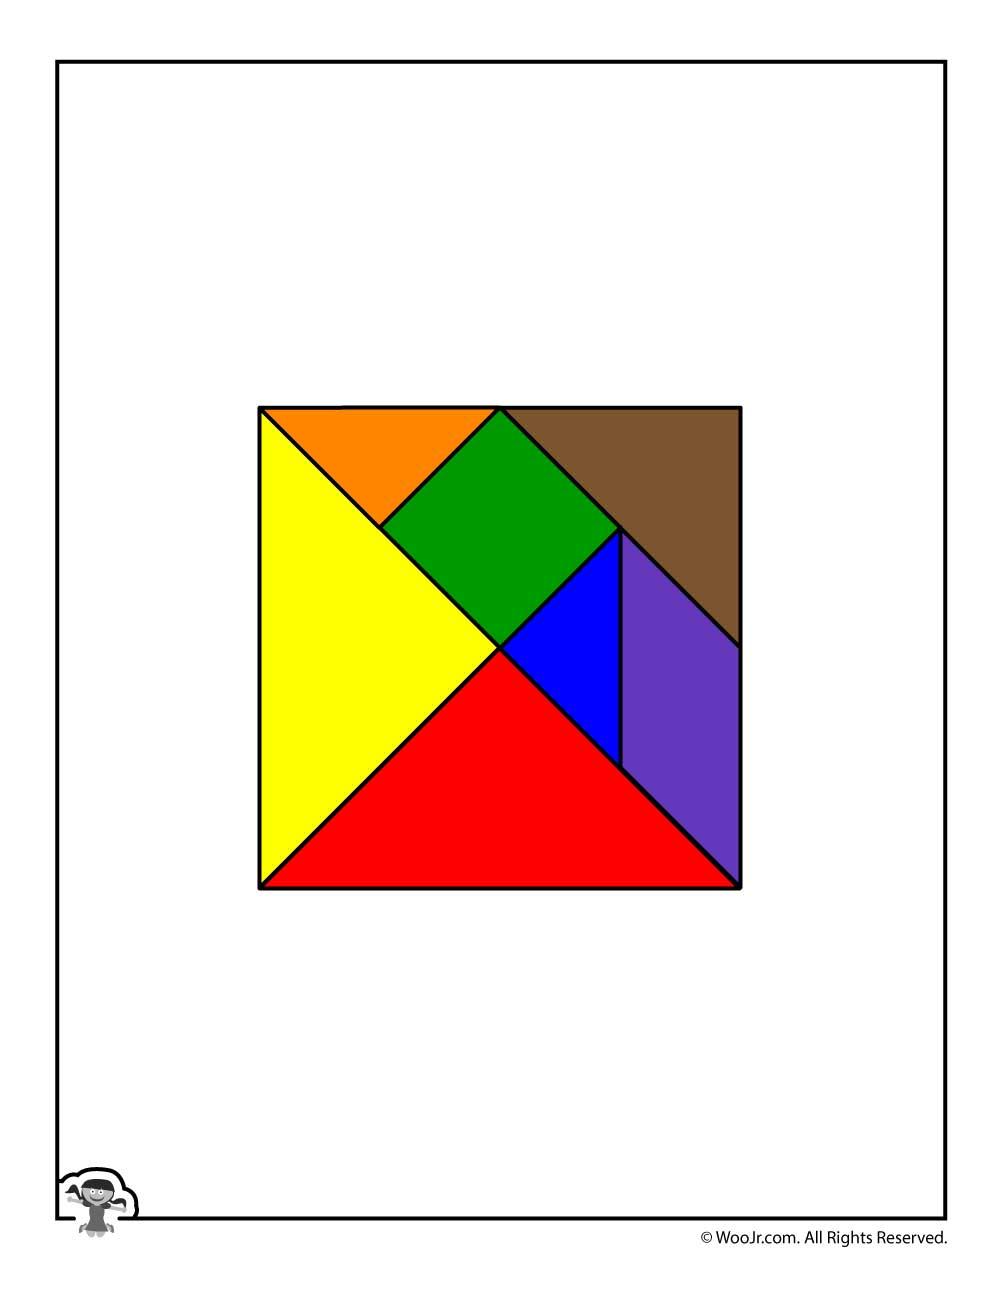 Printable Tangram Puzzle Pieces   Woo! Jr. Kids Activities - Printable Tangram Puzzle Pieces